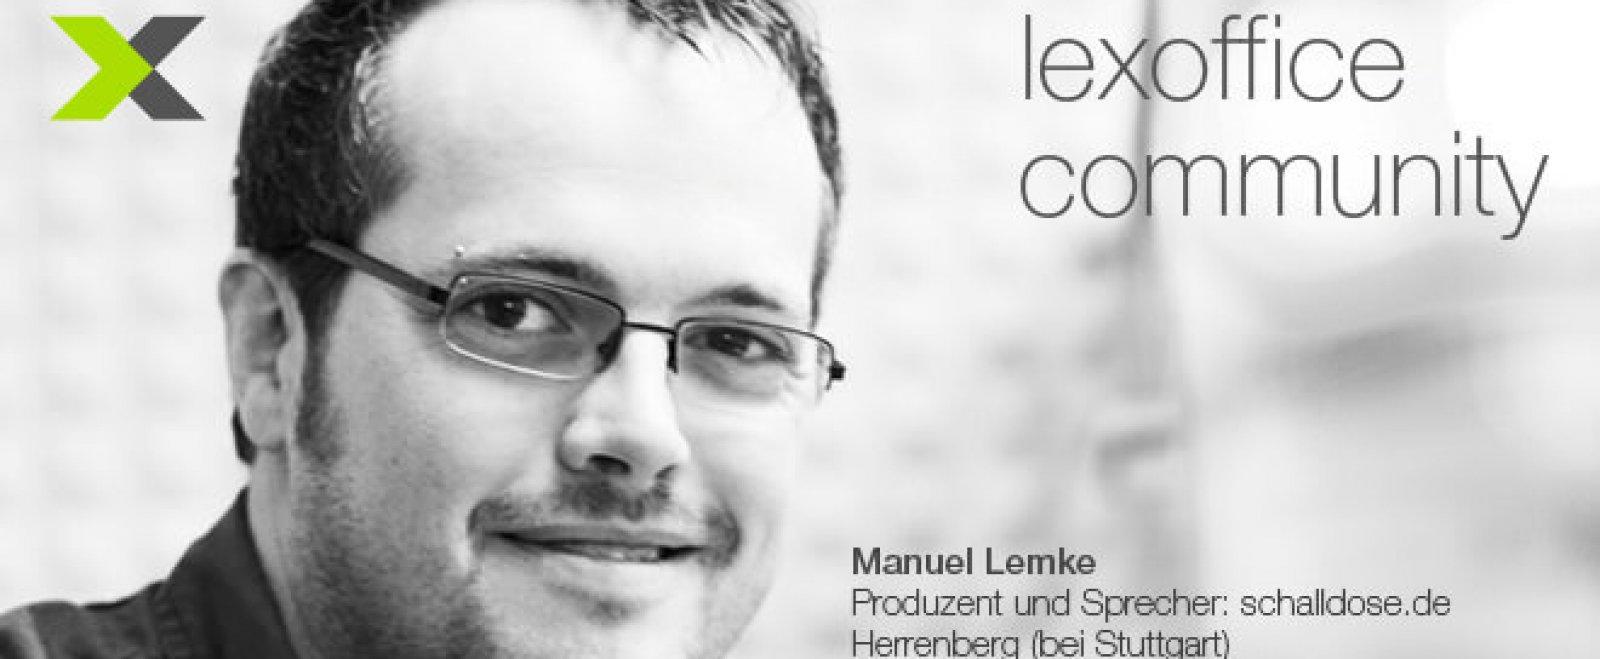 lexoffice Manuel Lemke